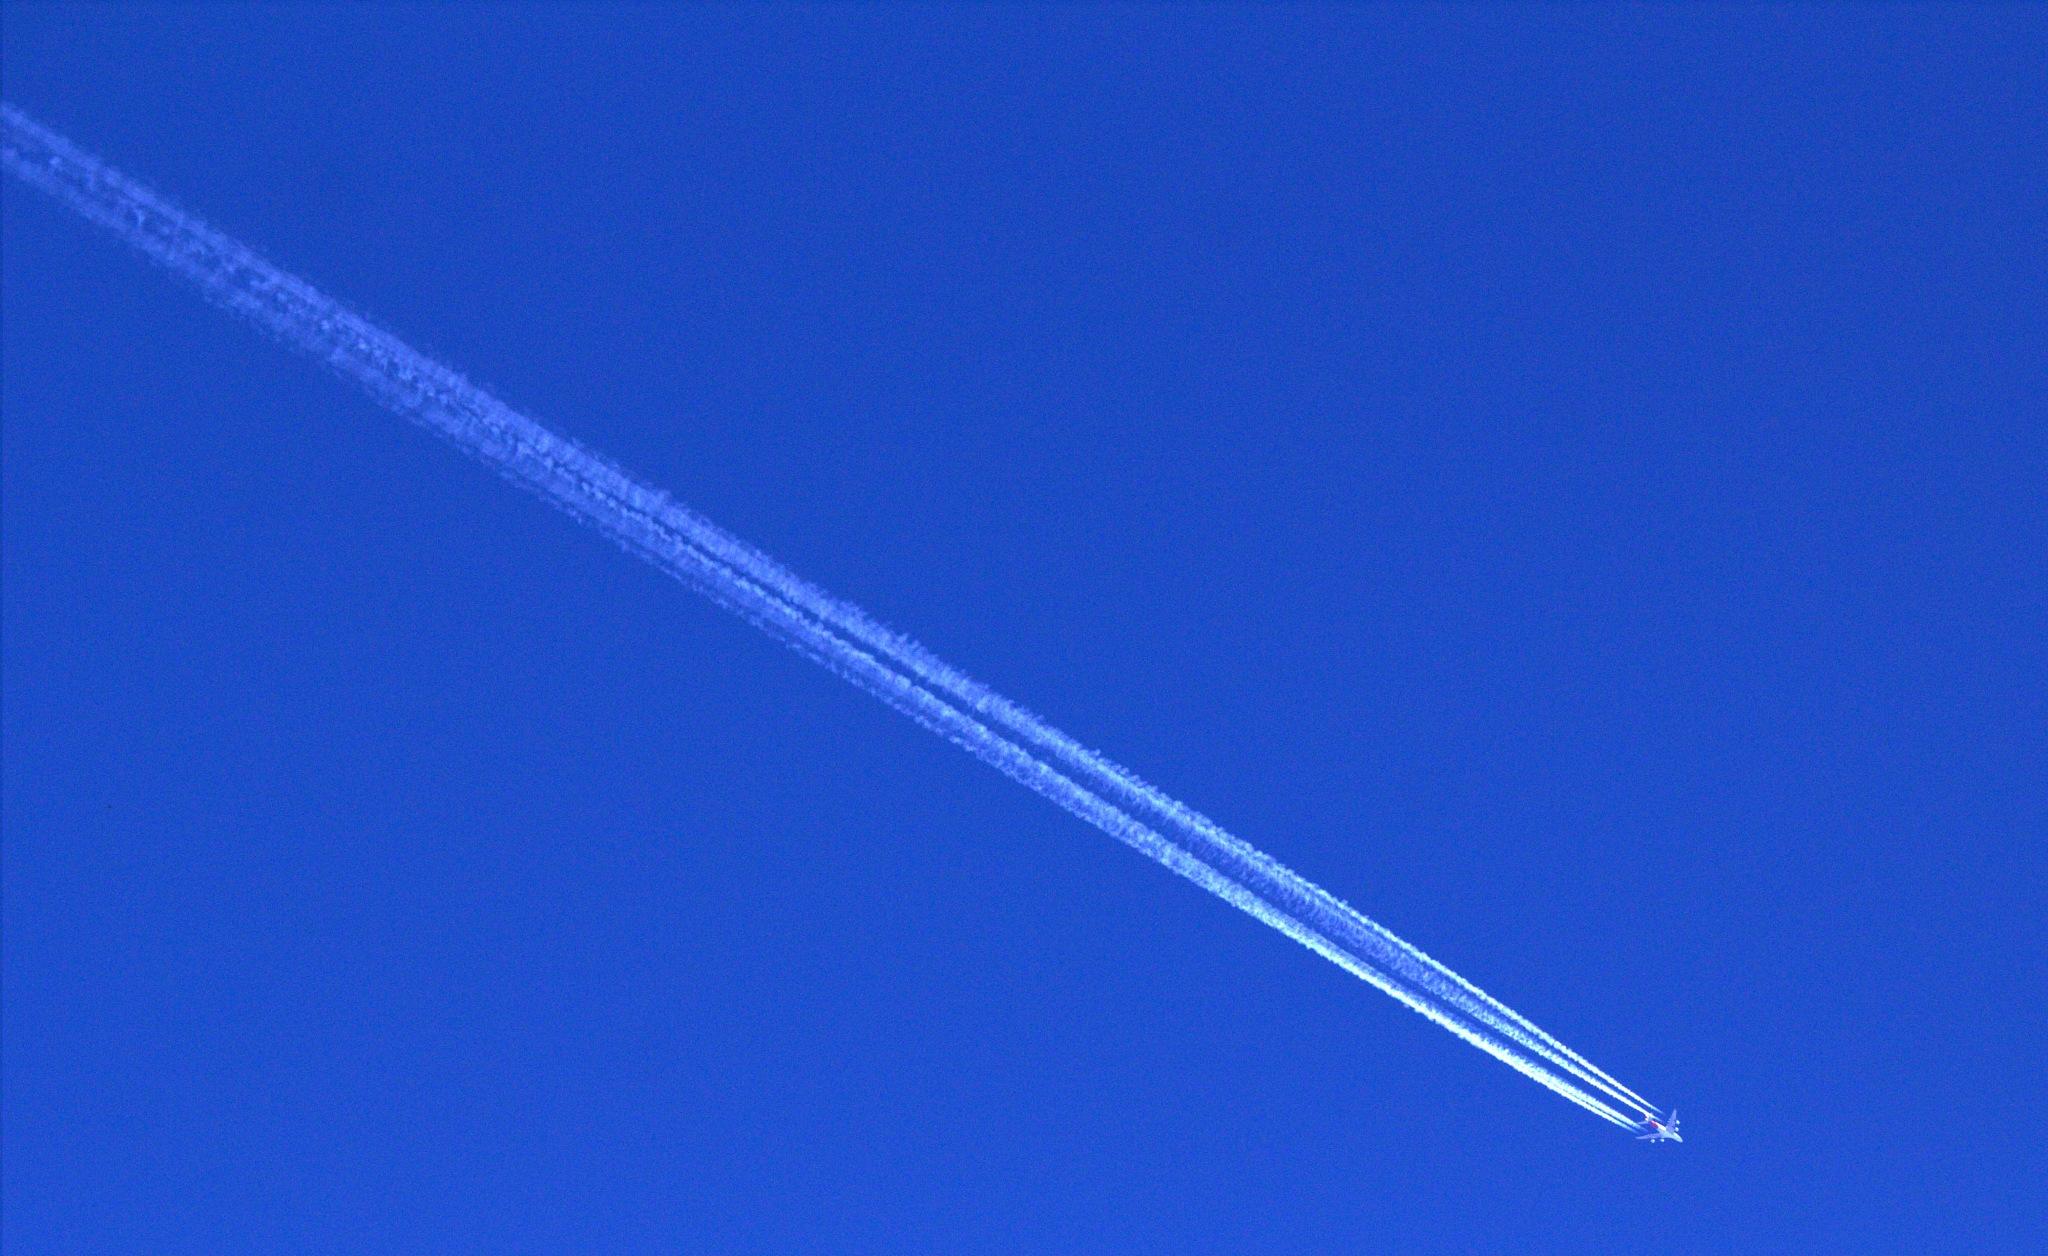 Fly bye by LyndaRealmshift